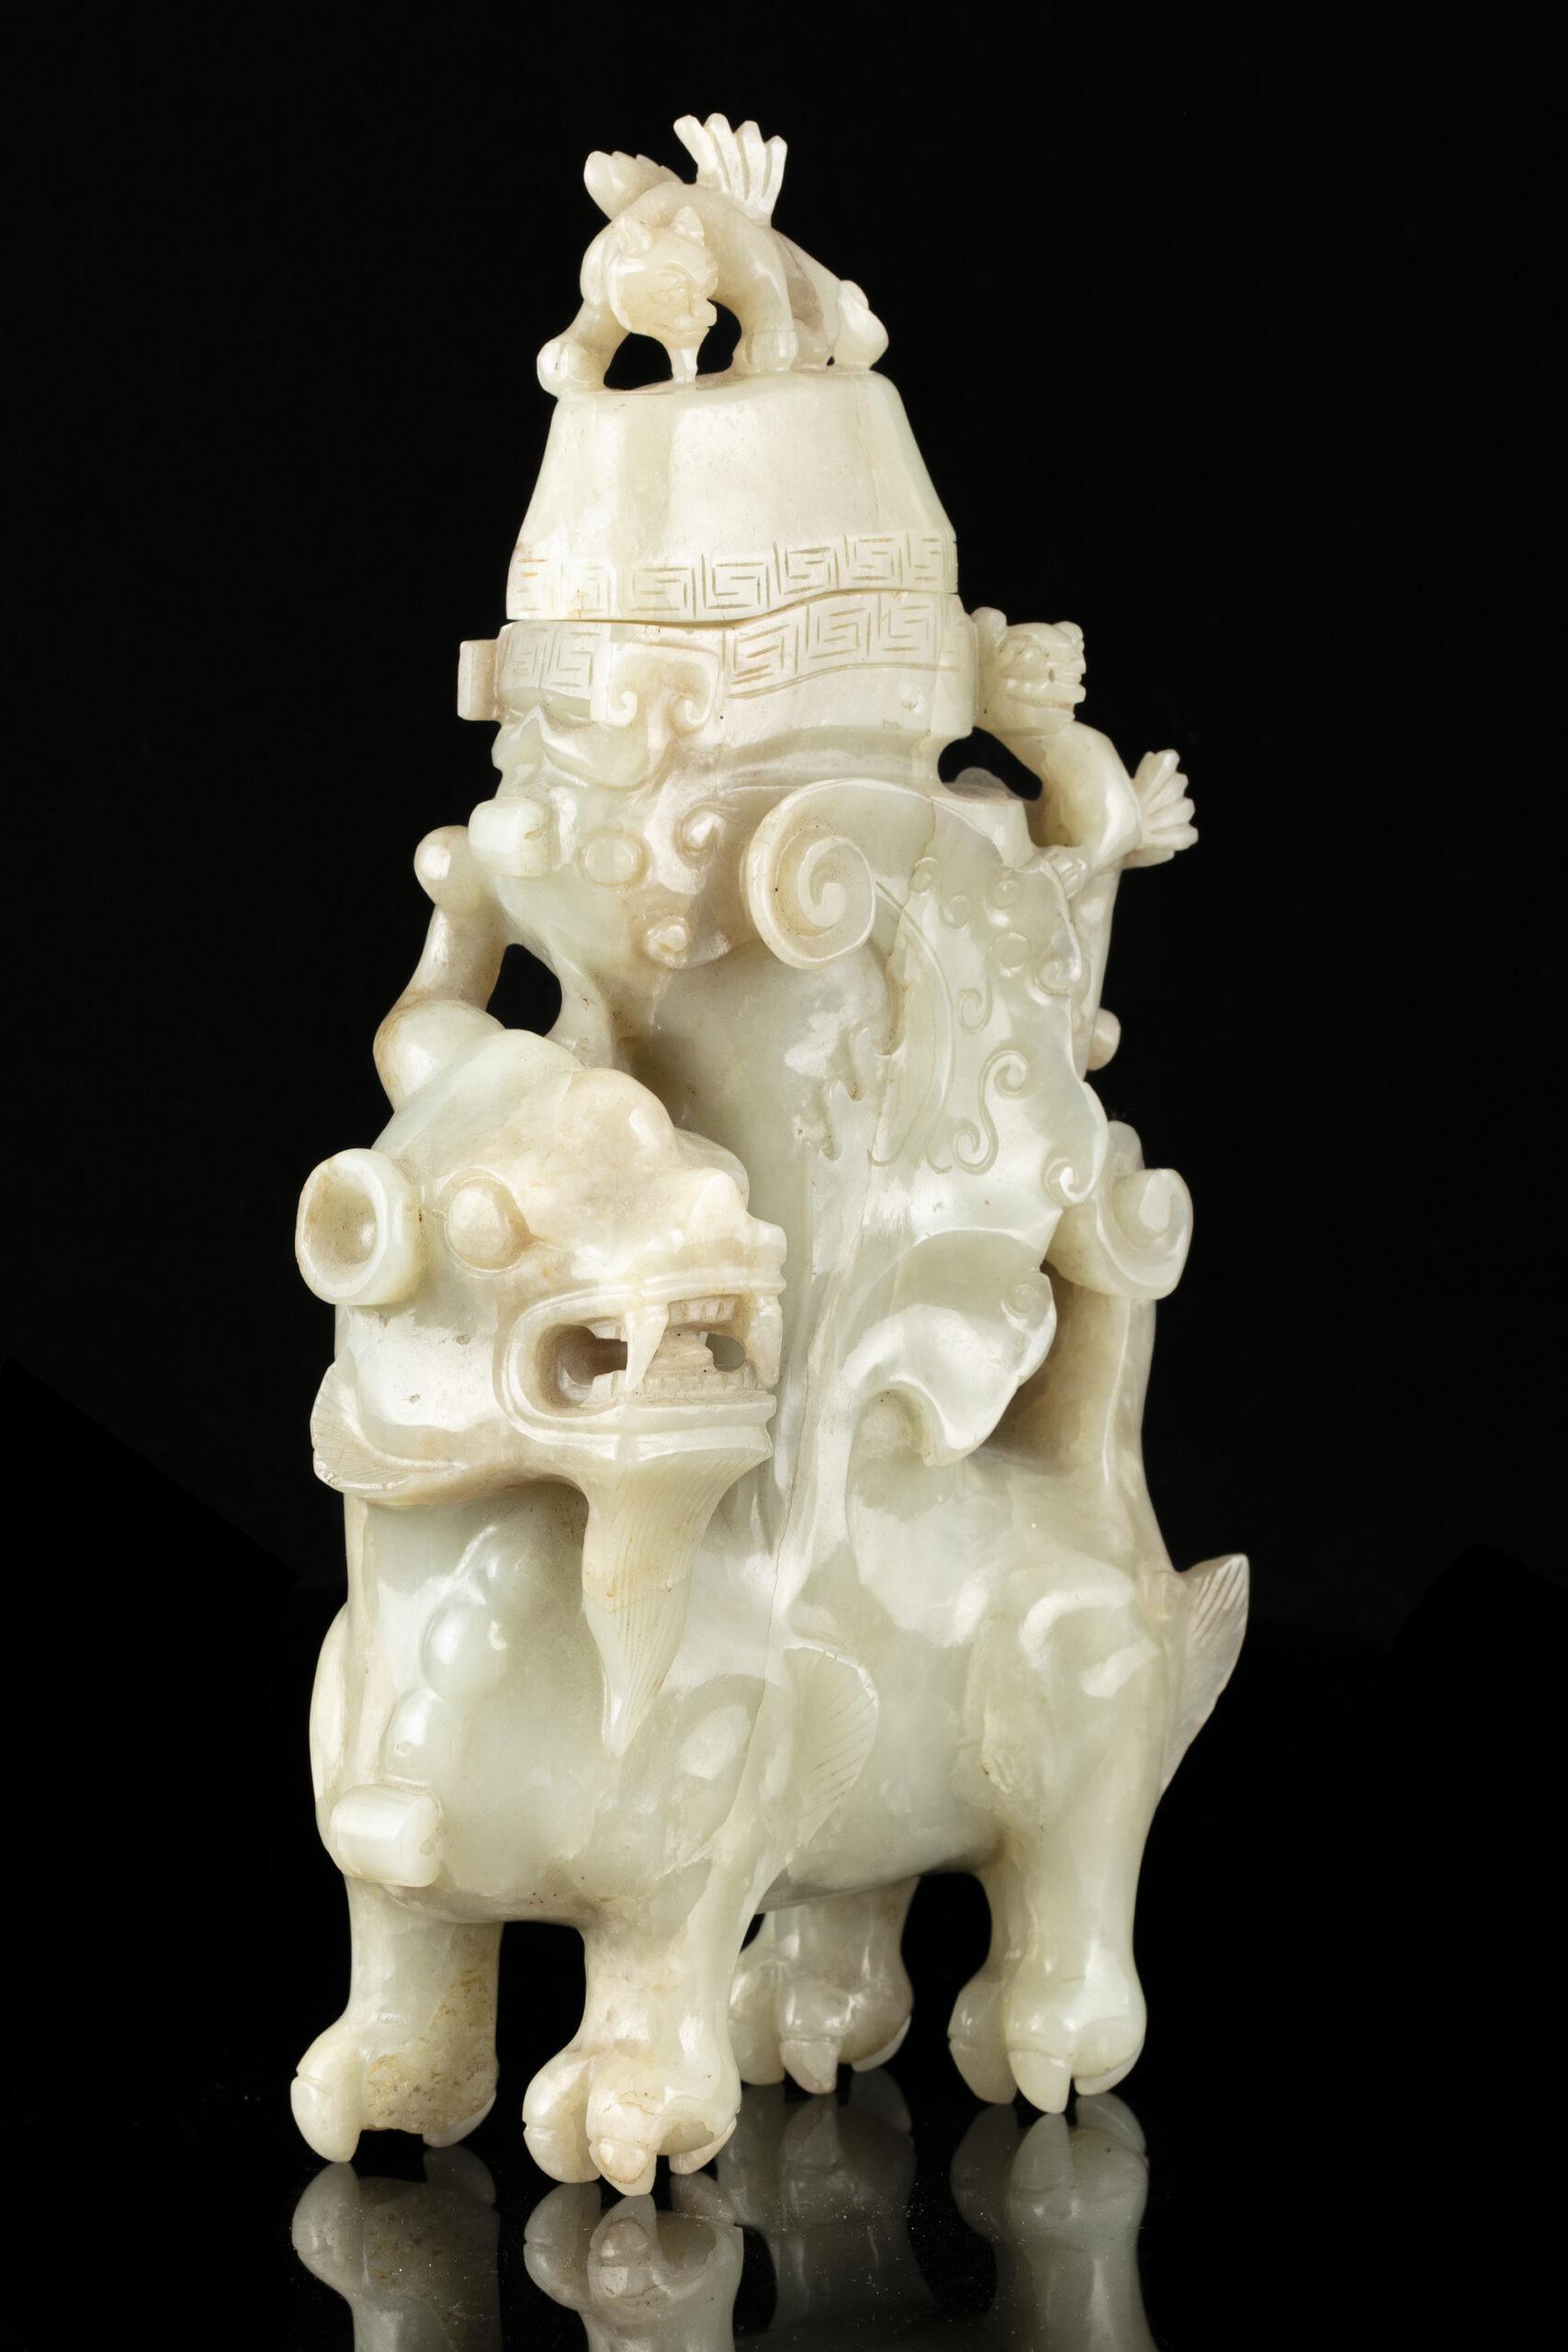 A JADE 'QILIN' ARCHAISTIC VESSEL AND COVER, RHYTON, CHINA, QING DYNASTY, 19TH C.